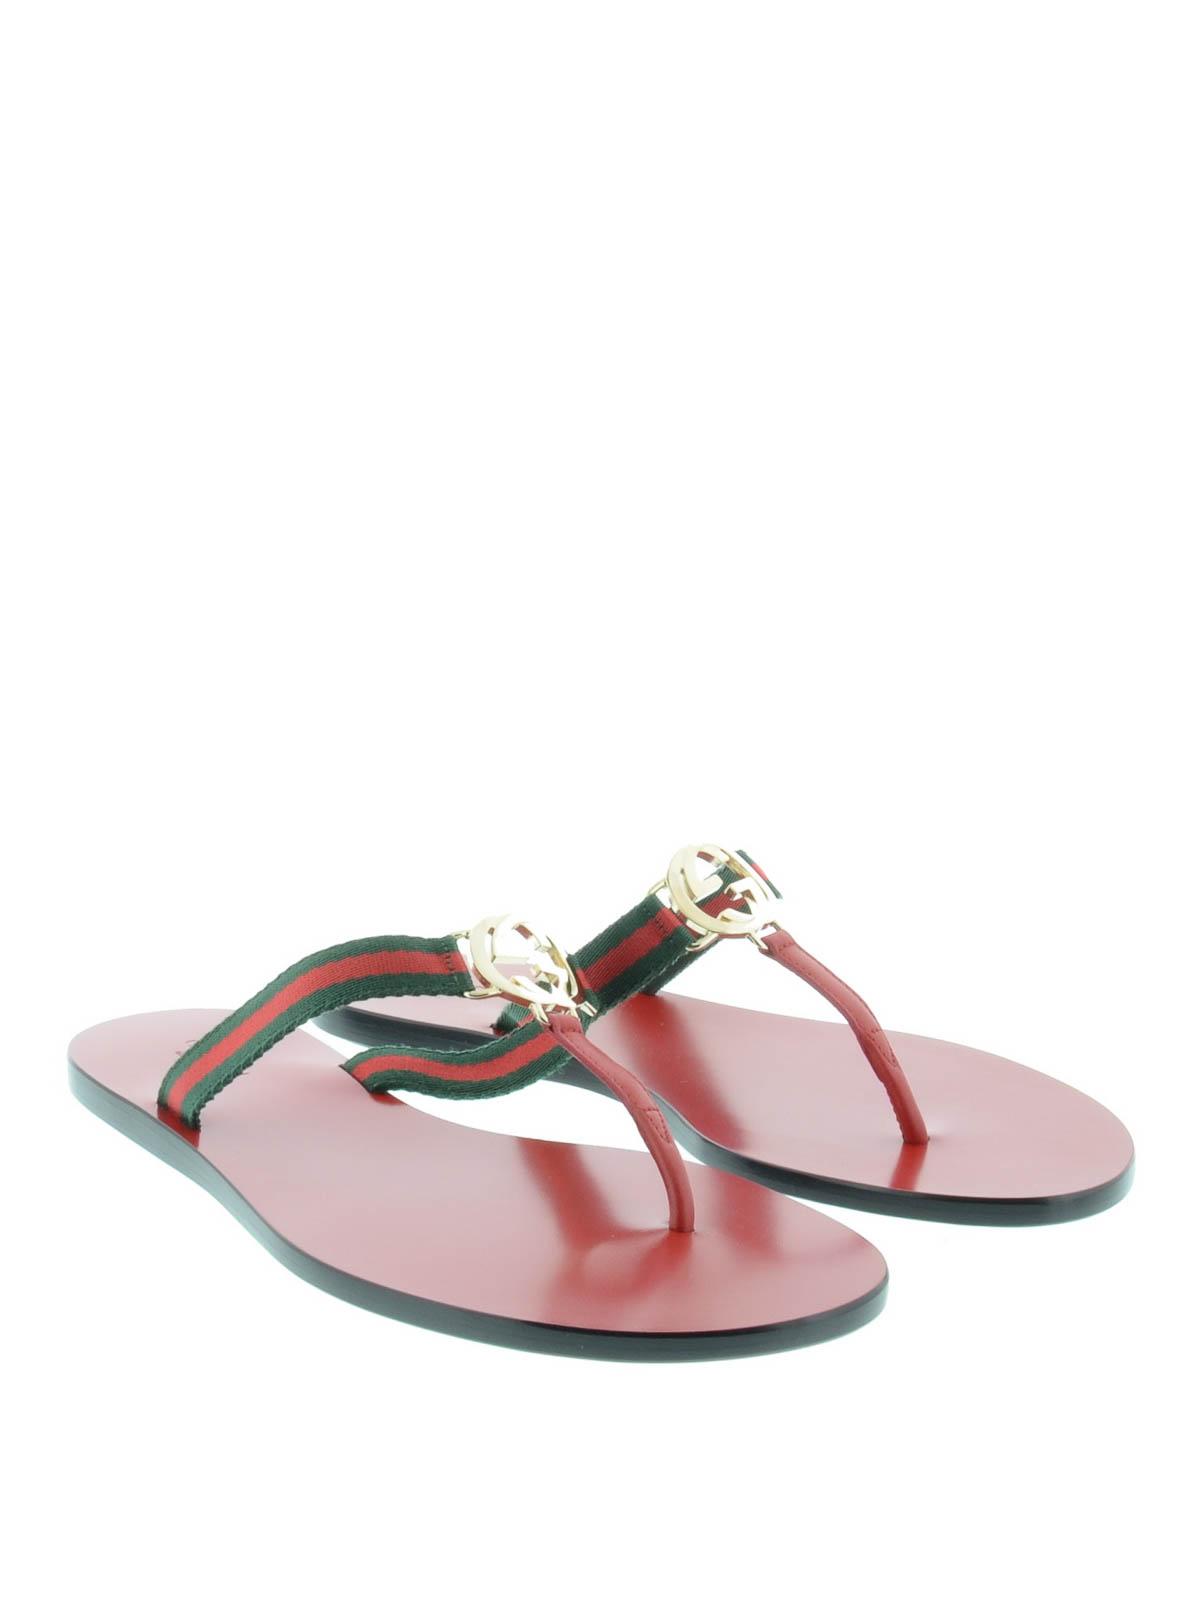 ef4e9b1808c4c1 Gucci - GG thong - flip flops - 388427 H9160 8482